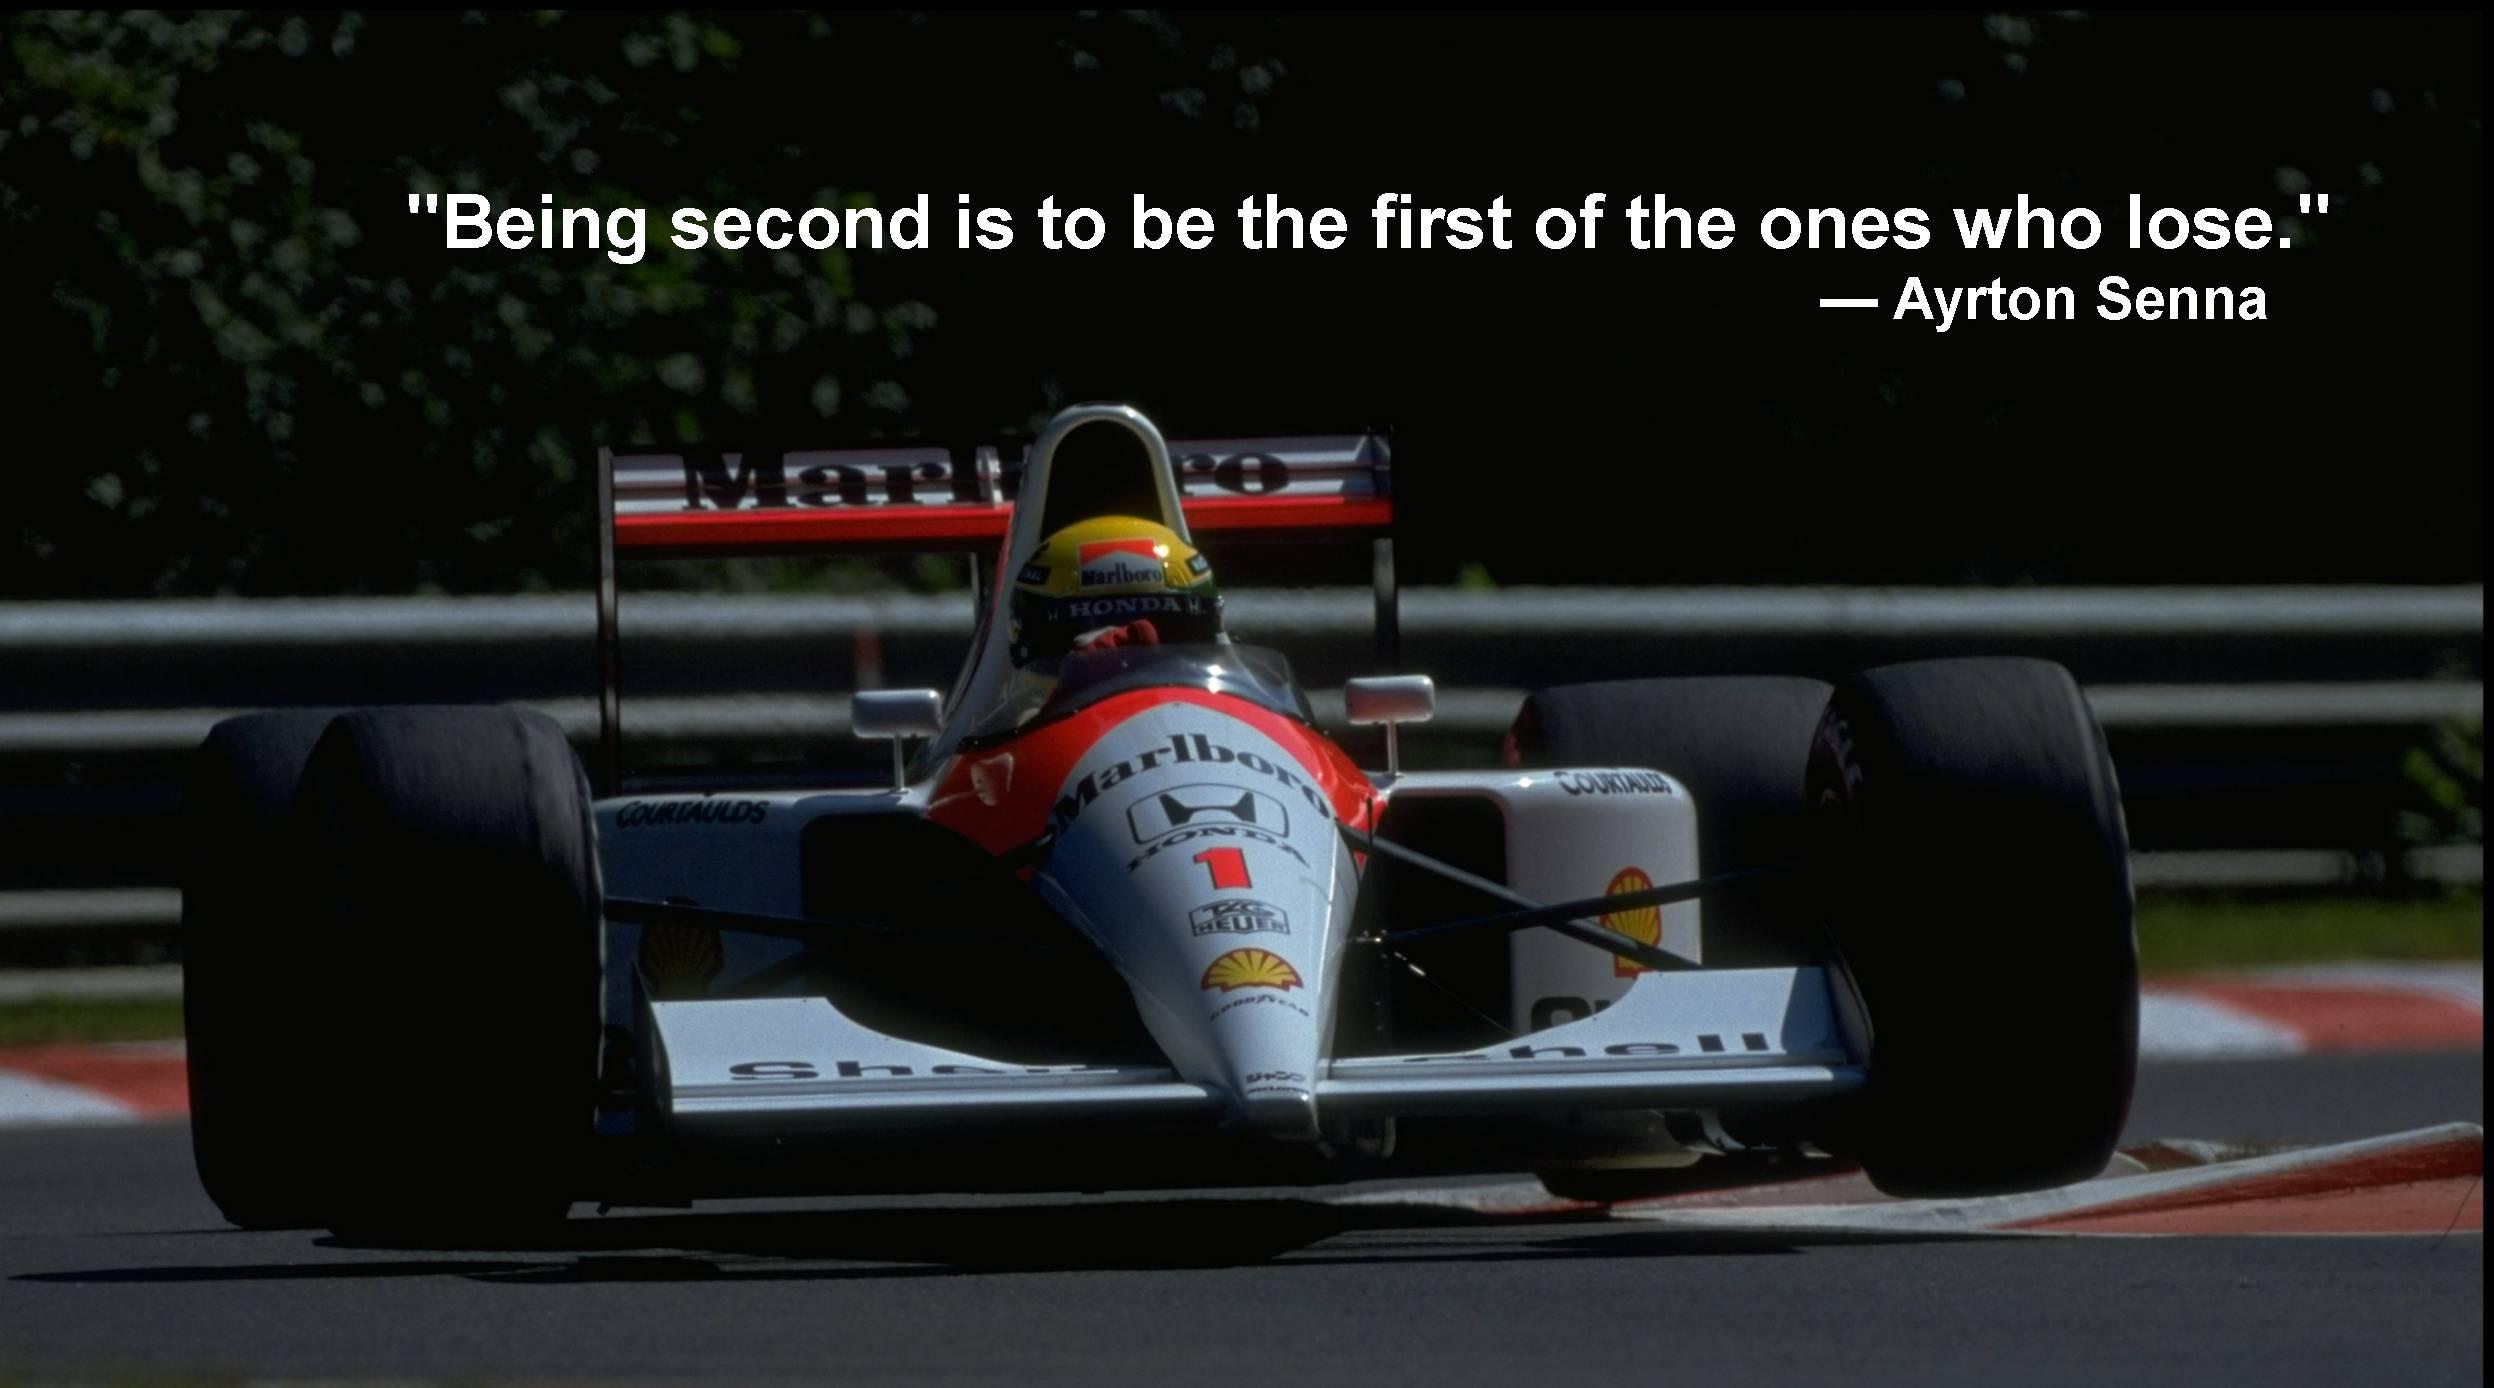 Ayrton Senna Quotes Image Quotes At Relatably Com: Chirag Patel